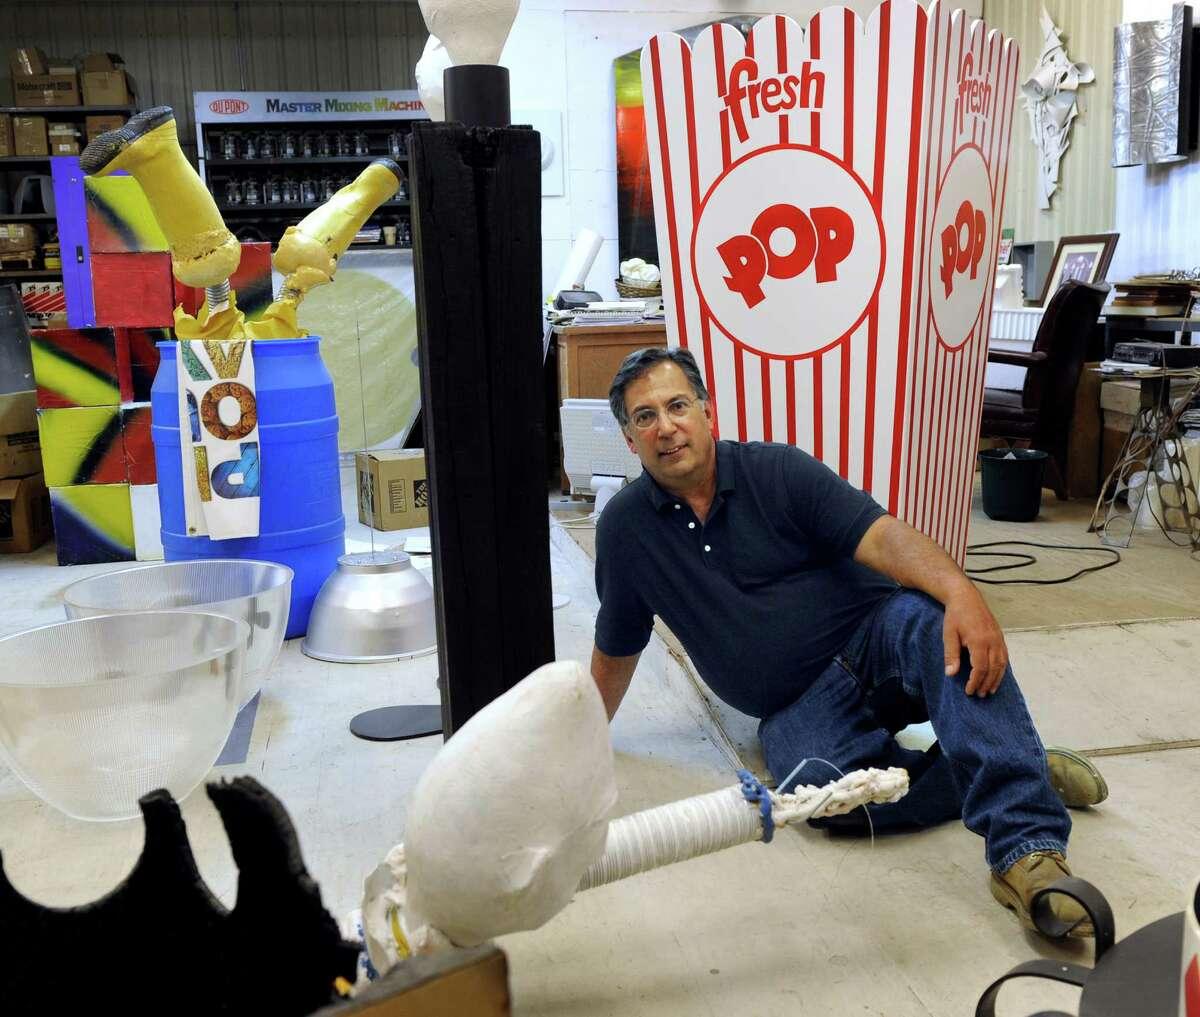 Jim Felice sits amid some of his artwork in his studio space in Danbury.